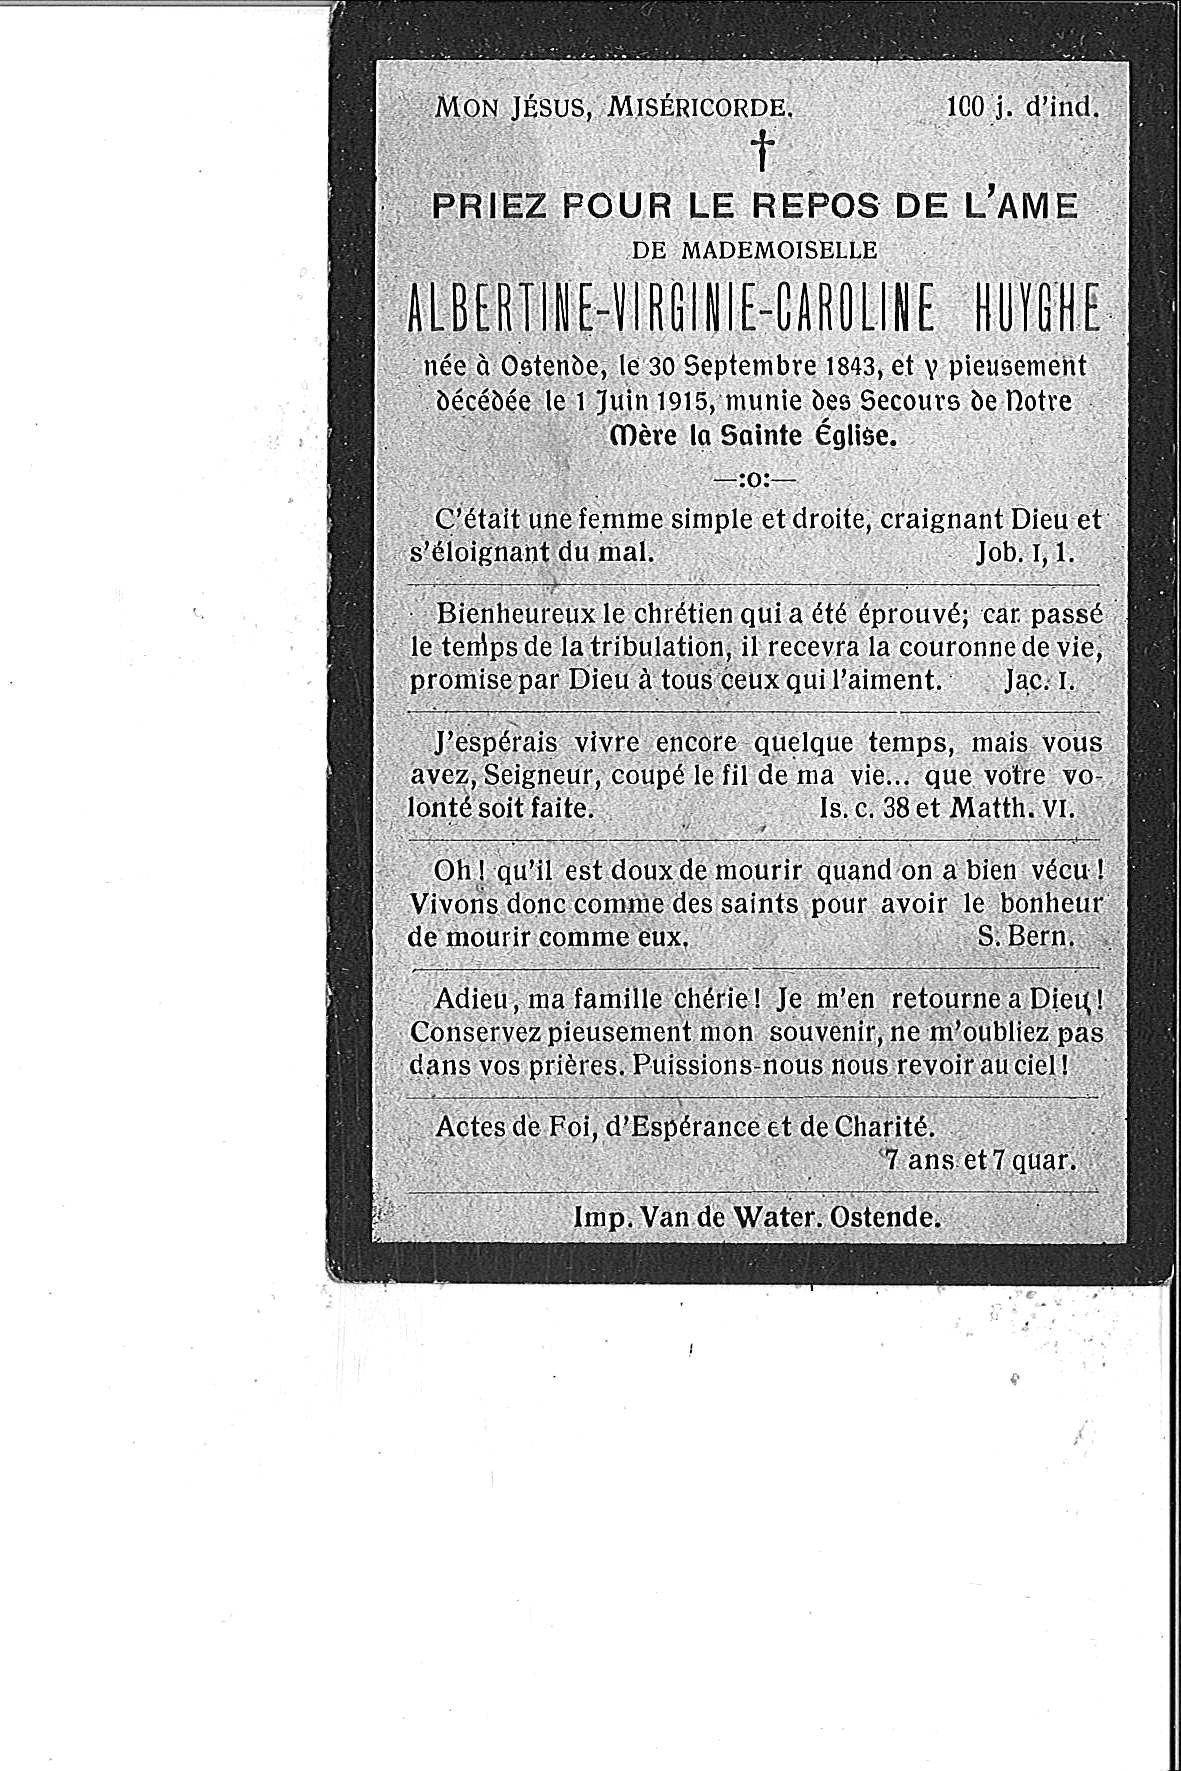 Albertine_Virginie_Caroline(1915)20150723112011_00008.jpg